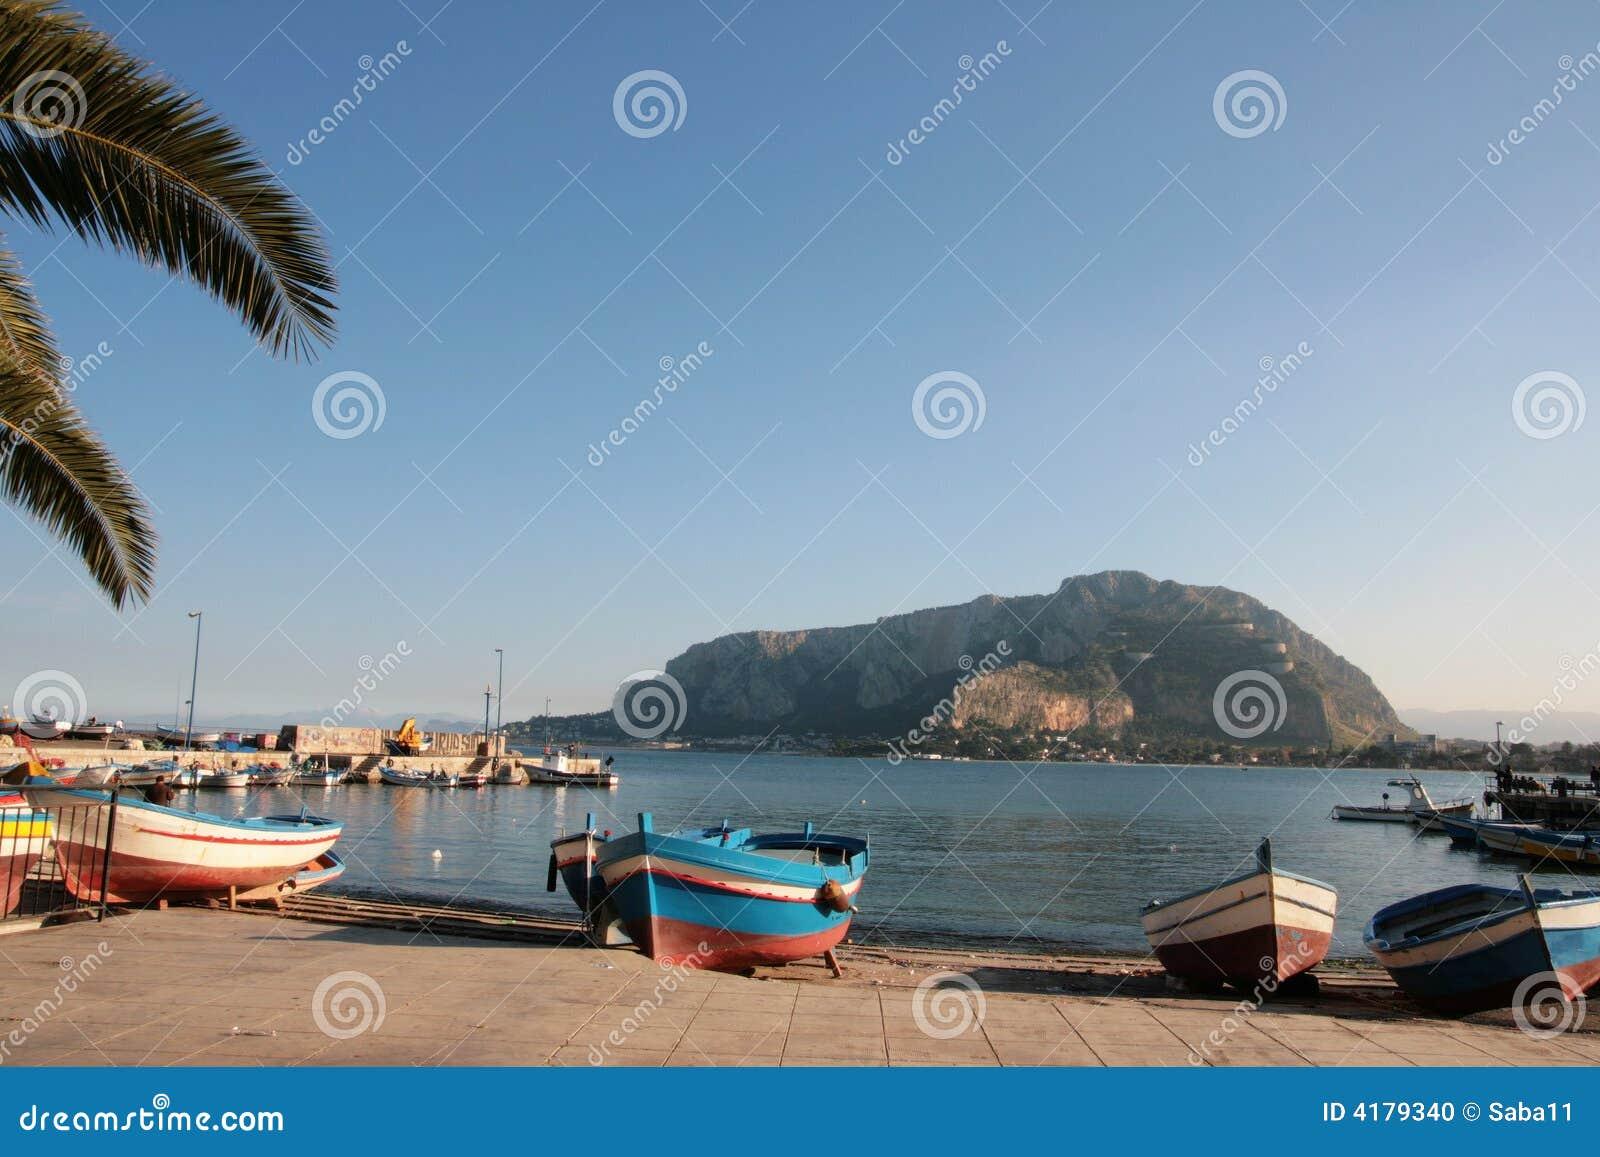 Mount, sea & sky, Palermo